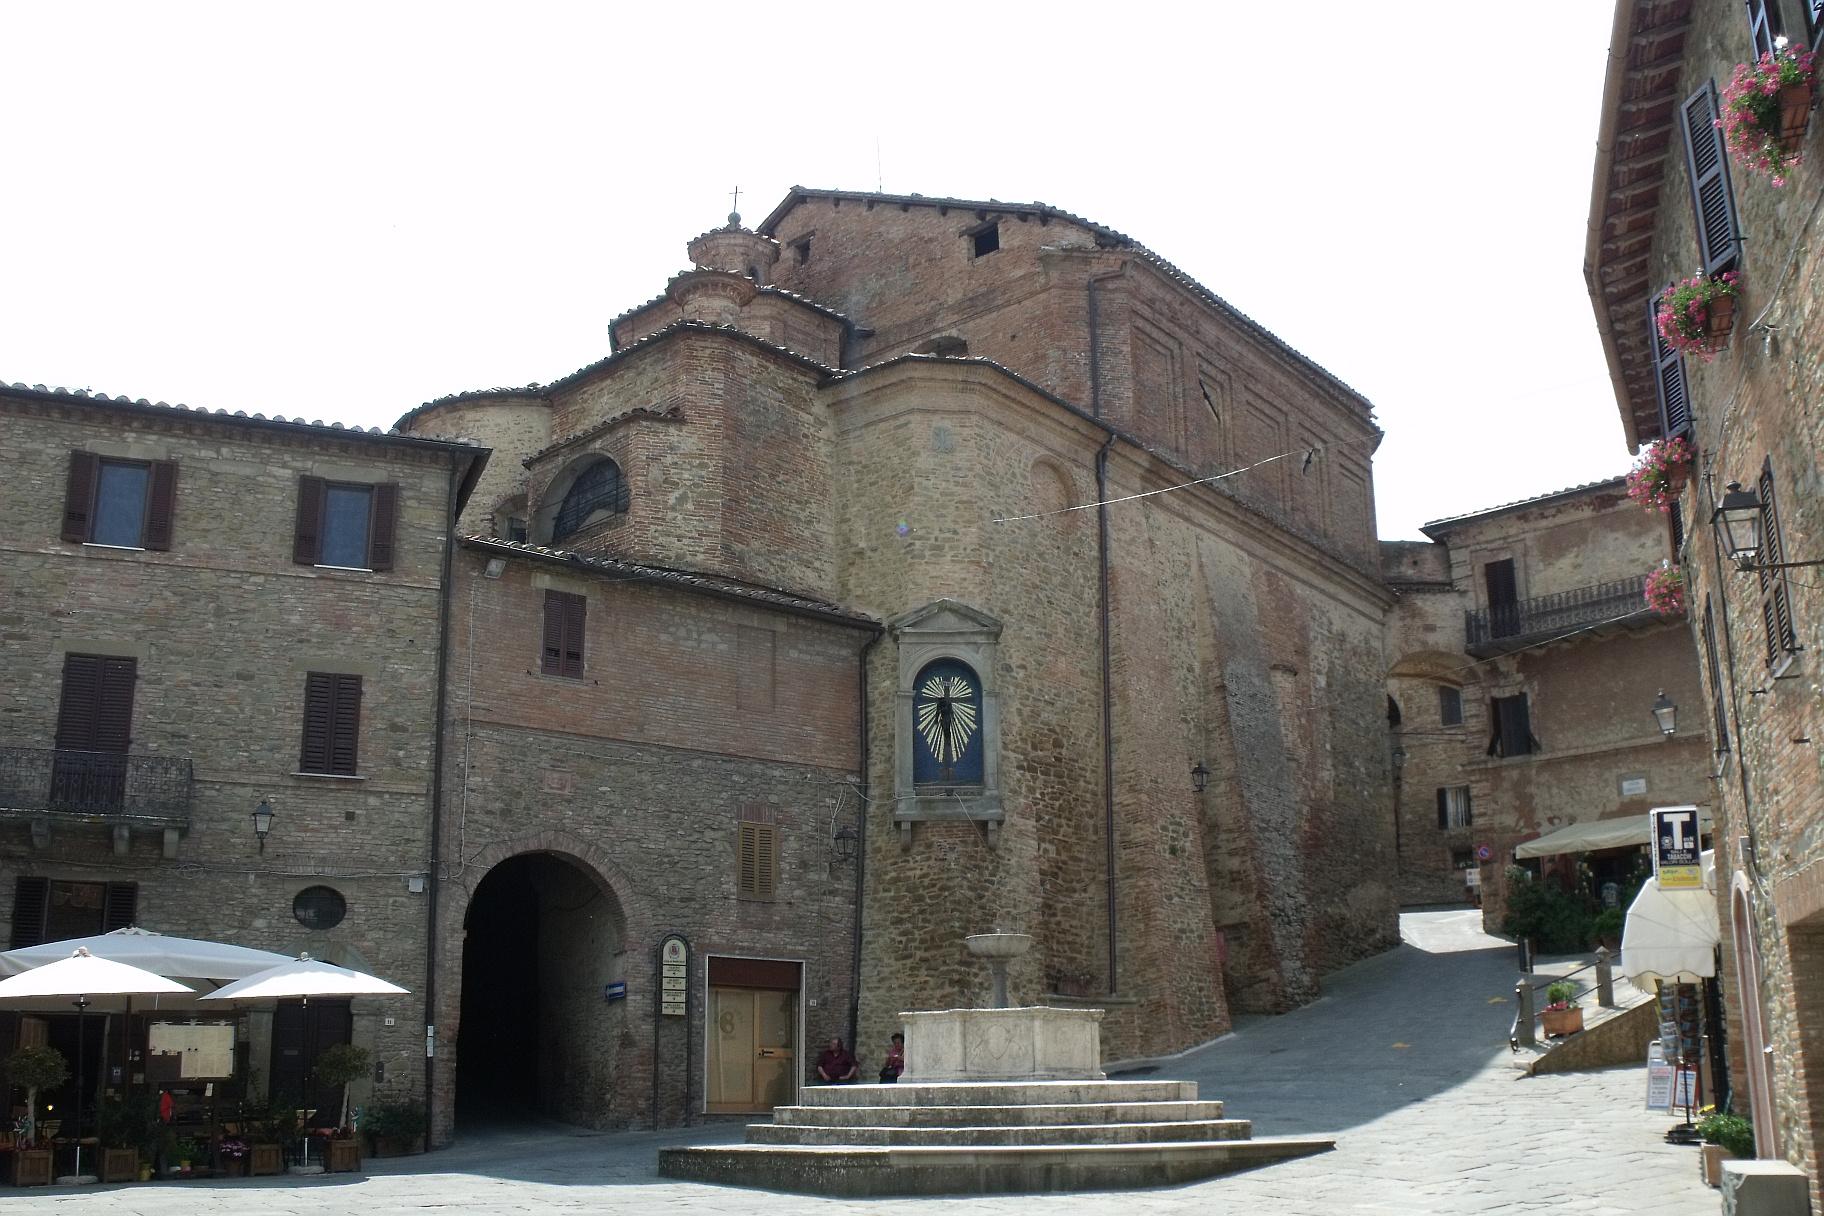 La Chiesa di San Michele arcangelo a Panicale, foto di LigaDue su wikipedia.org